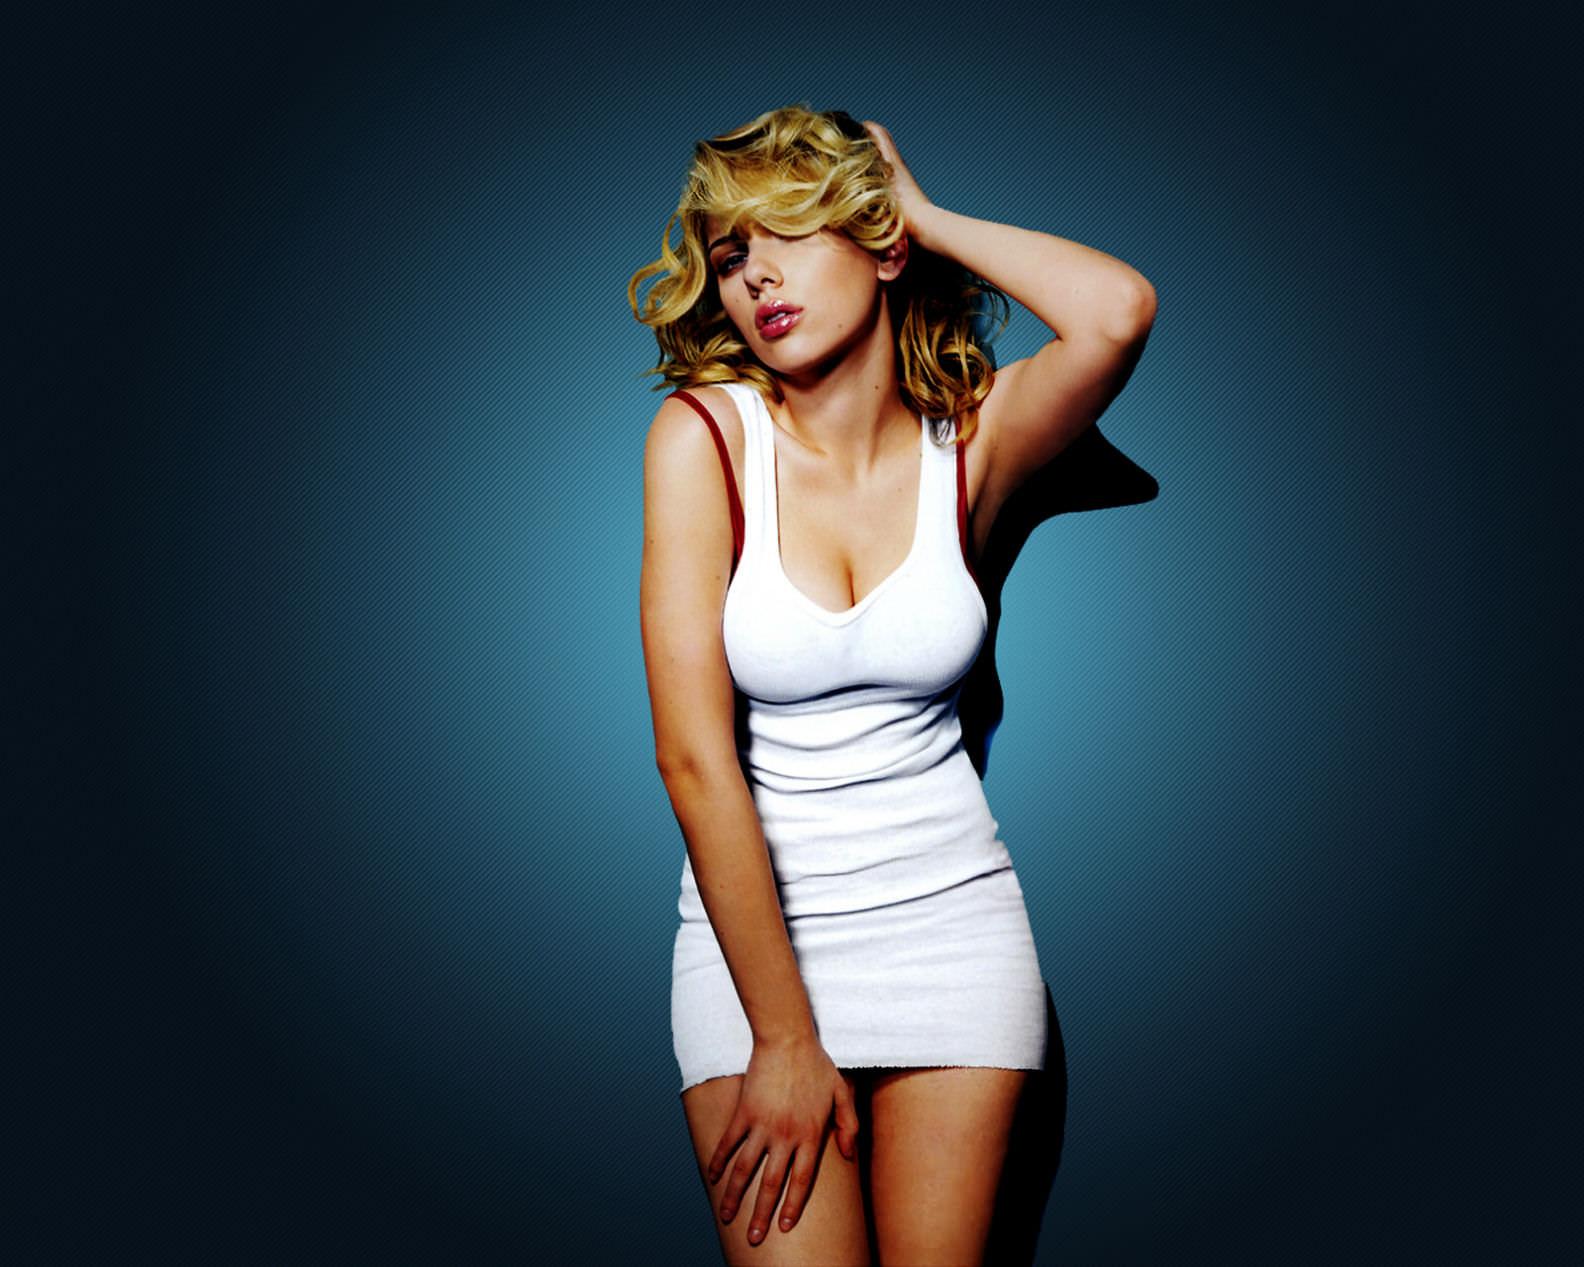 Scarlett Johansson widescreen for desktop